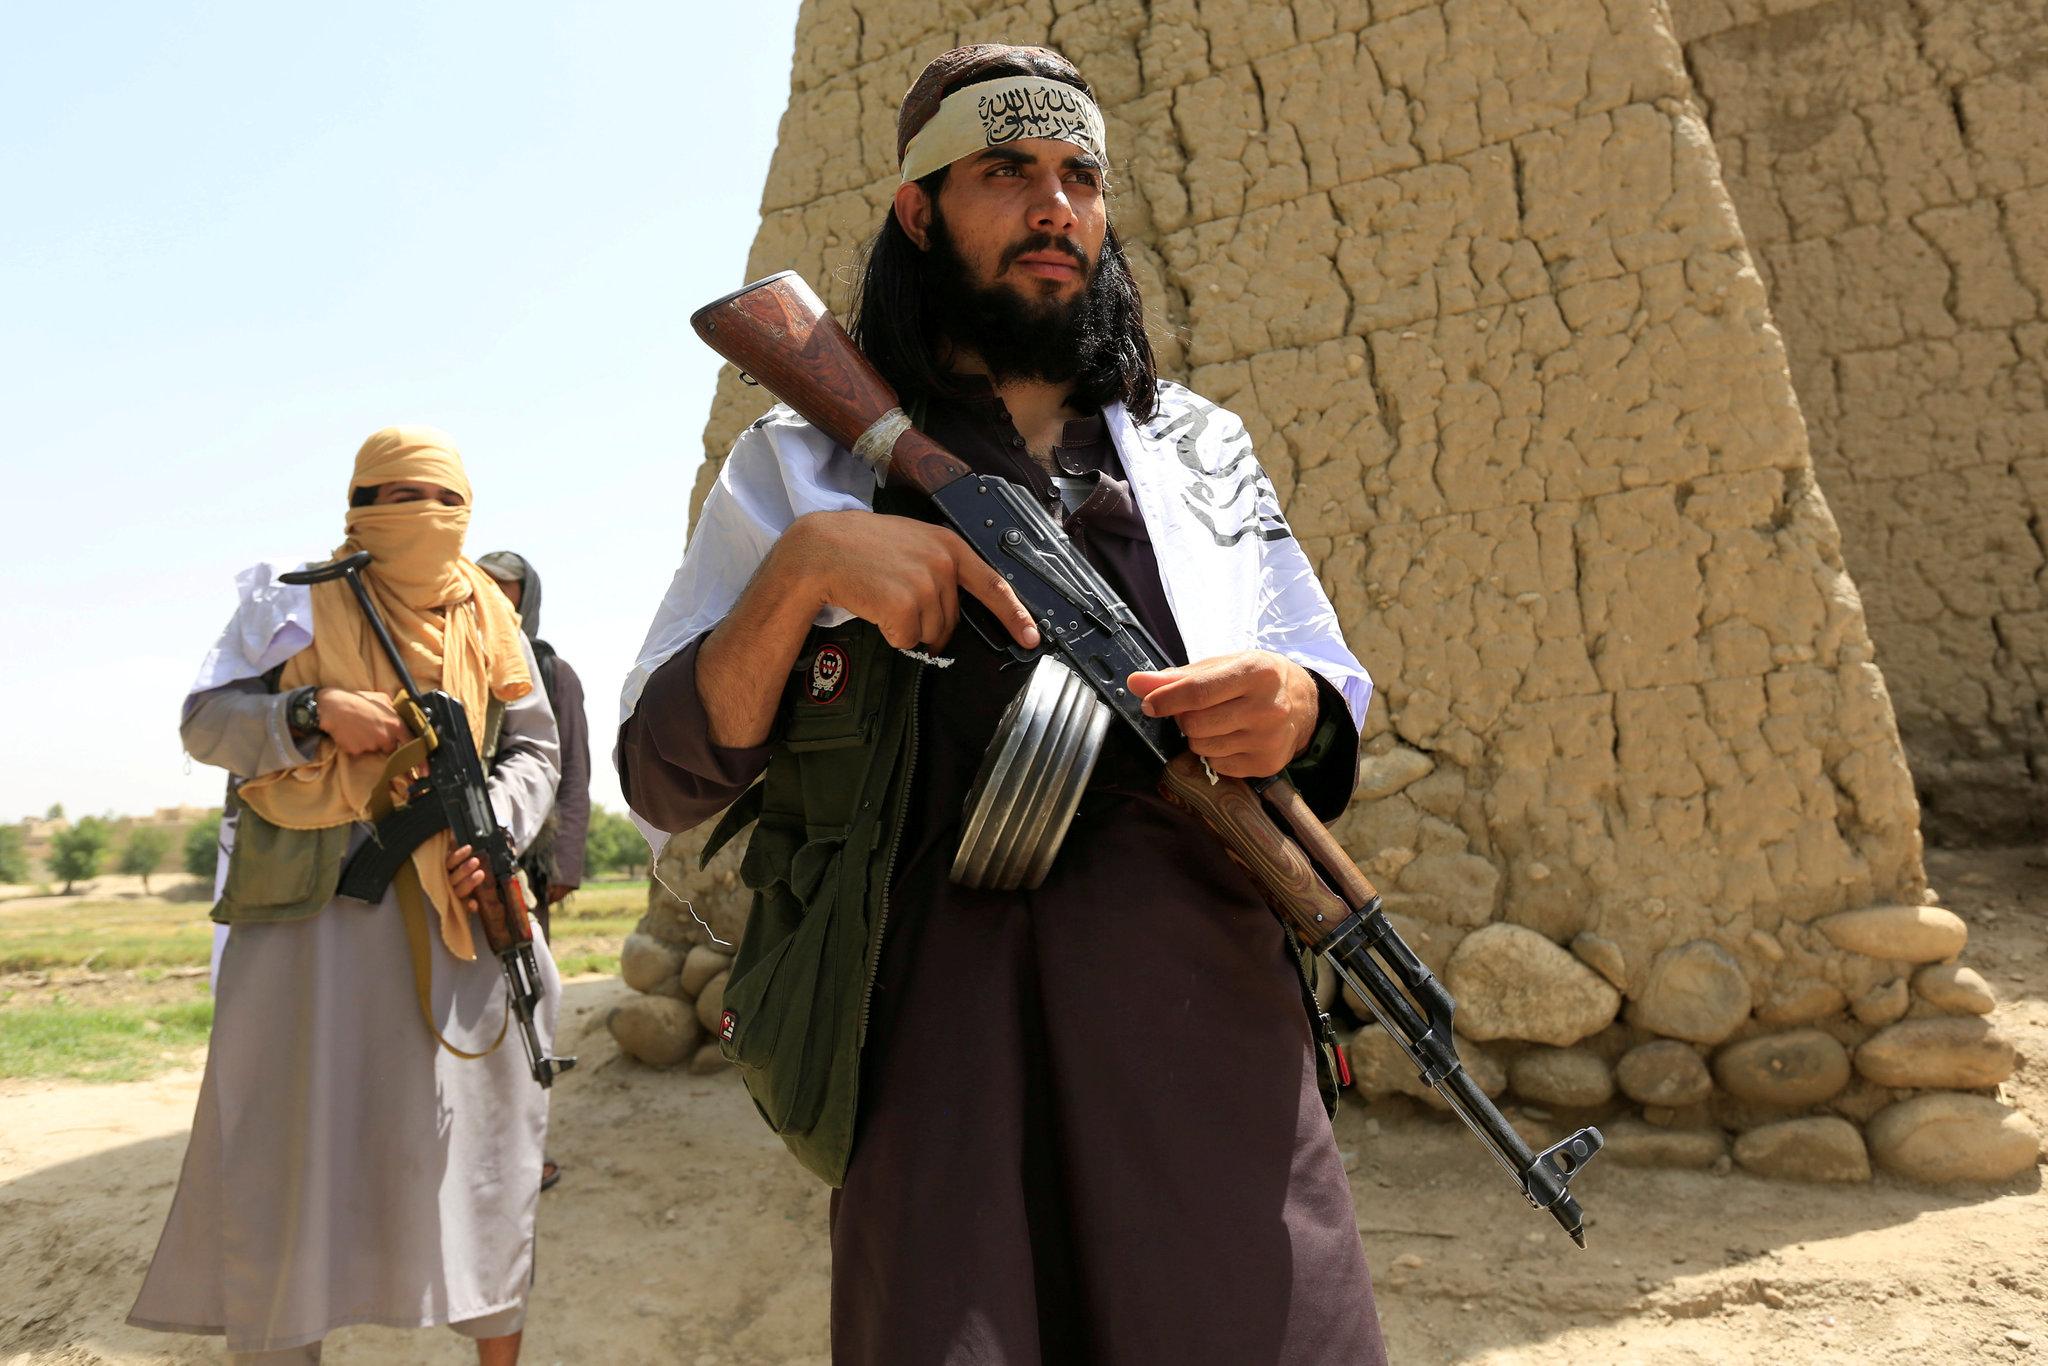 Талибы заживо сожгли девушку из-за невкусного обеда